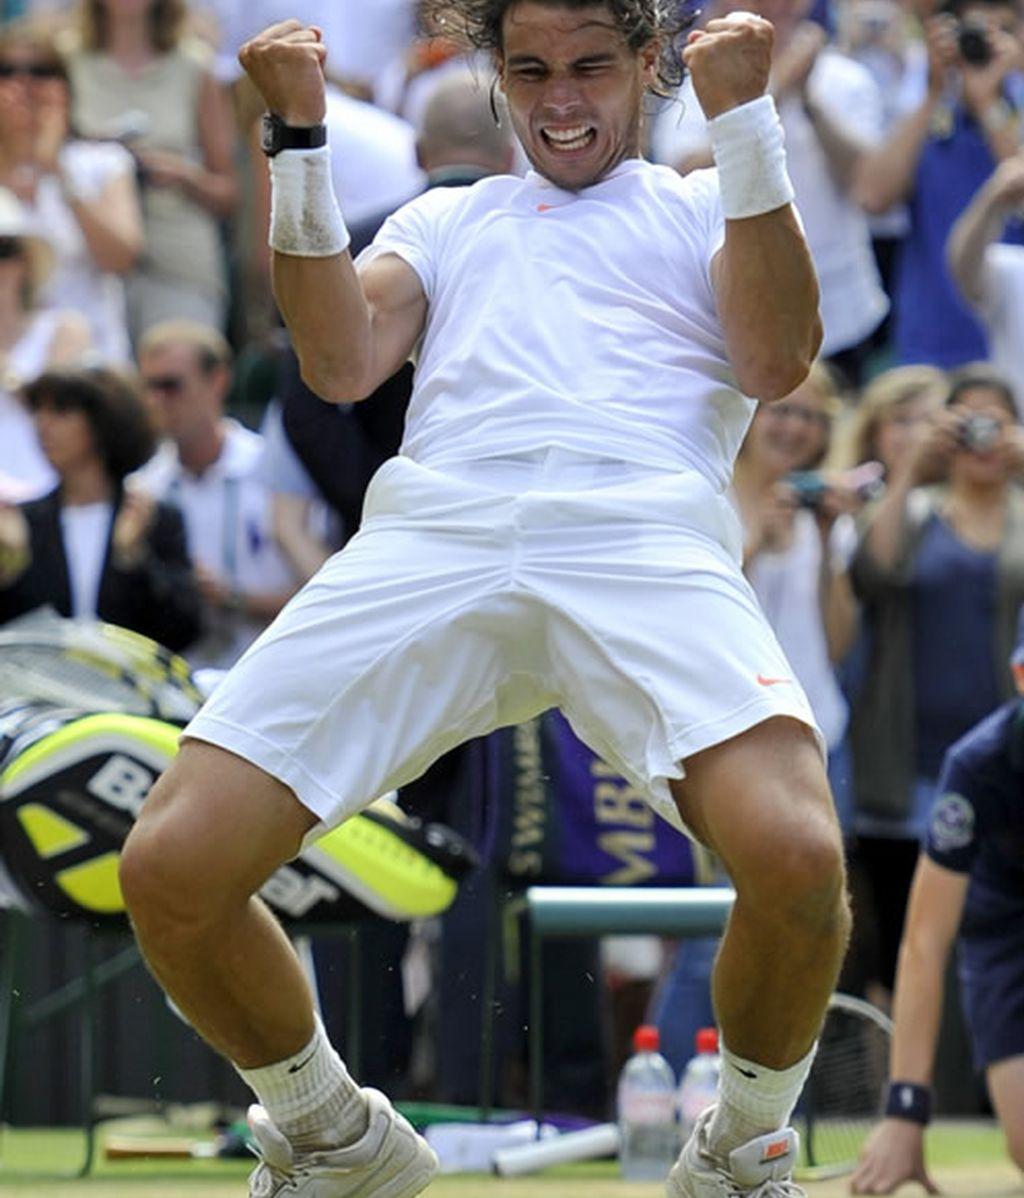 Nadal, campeón de Wimbledon 2010